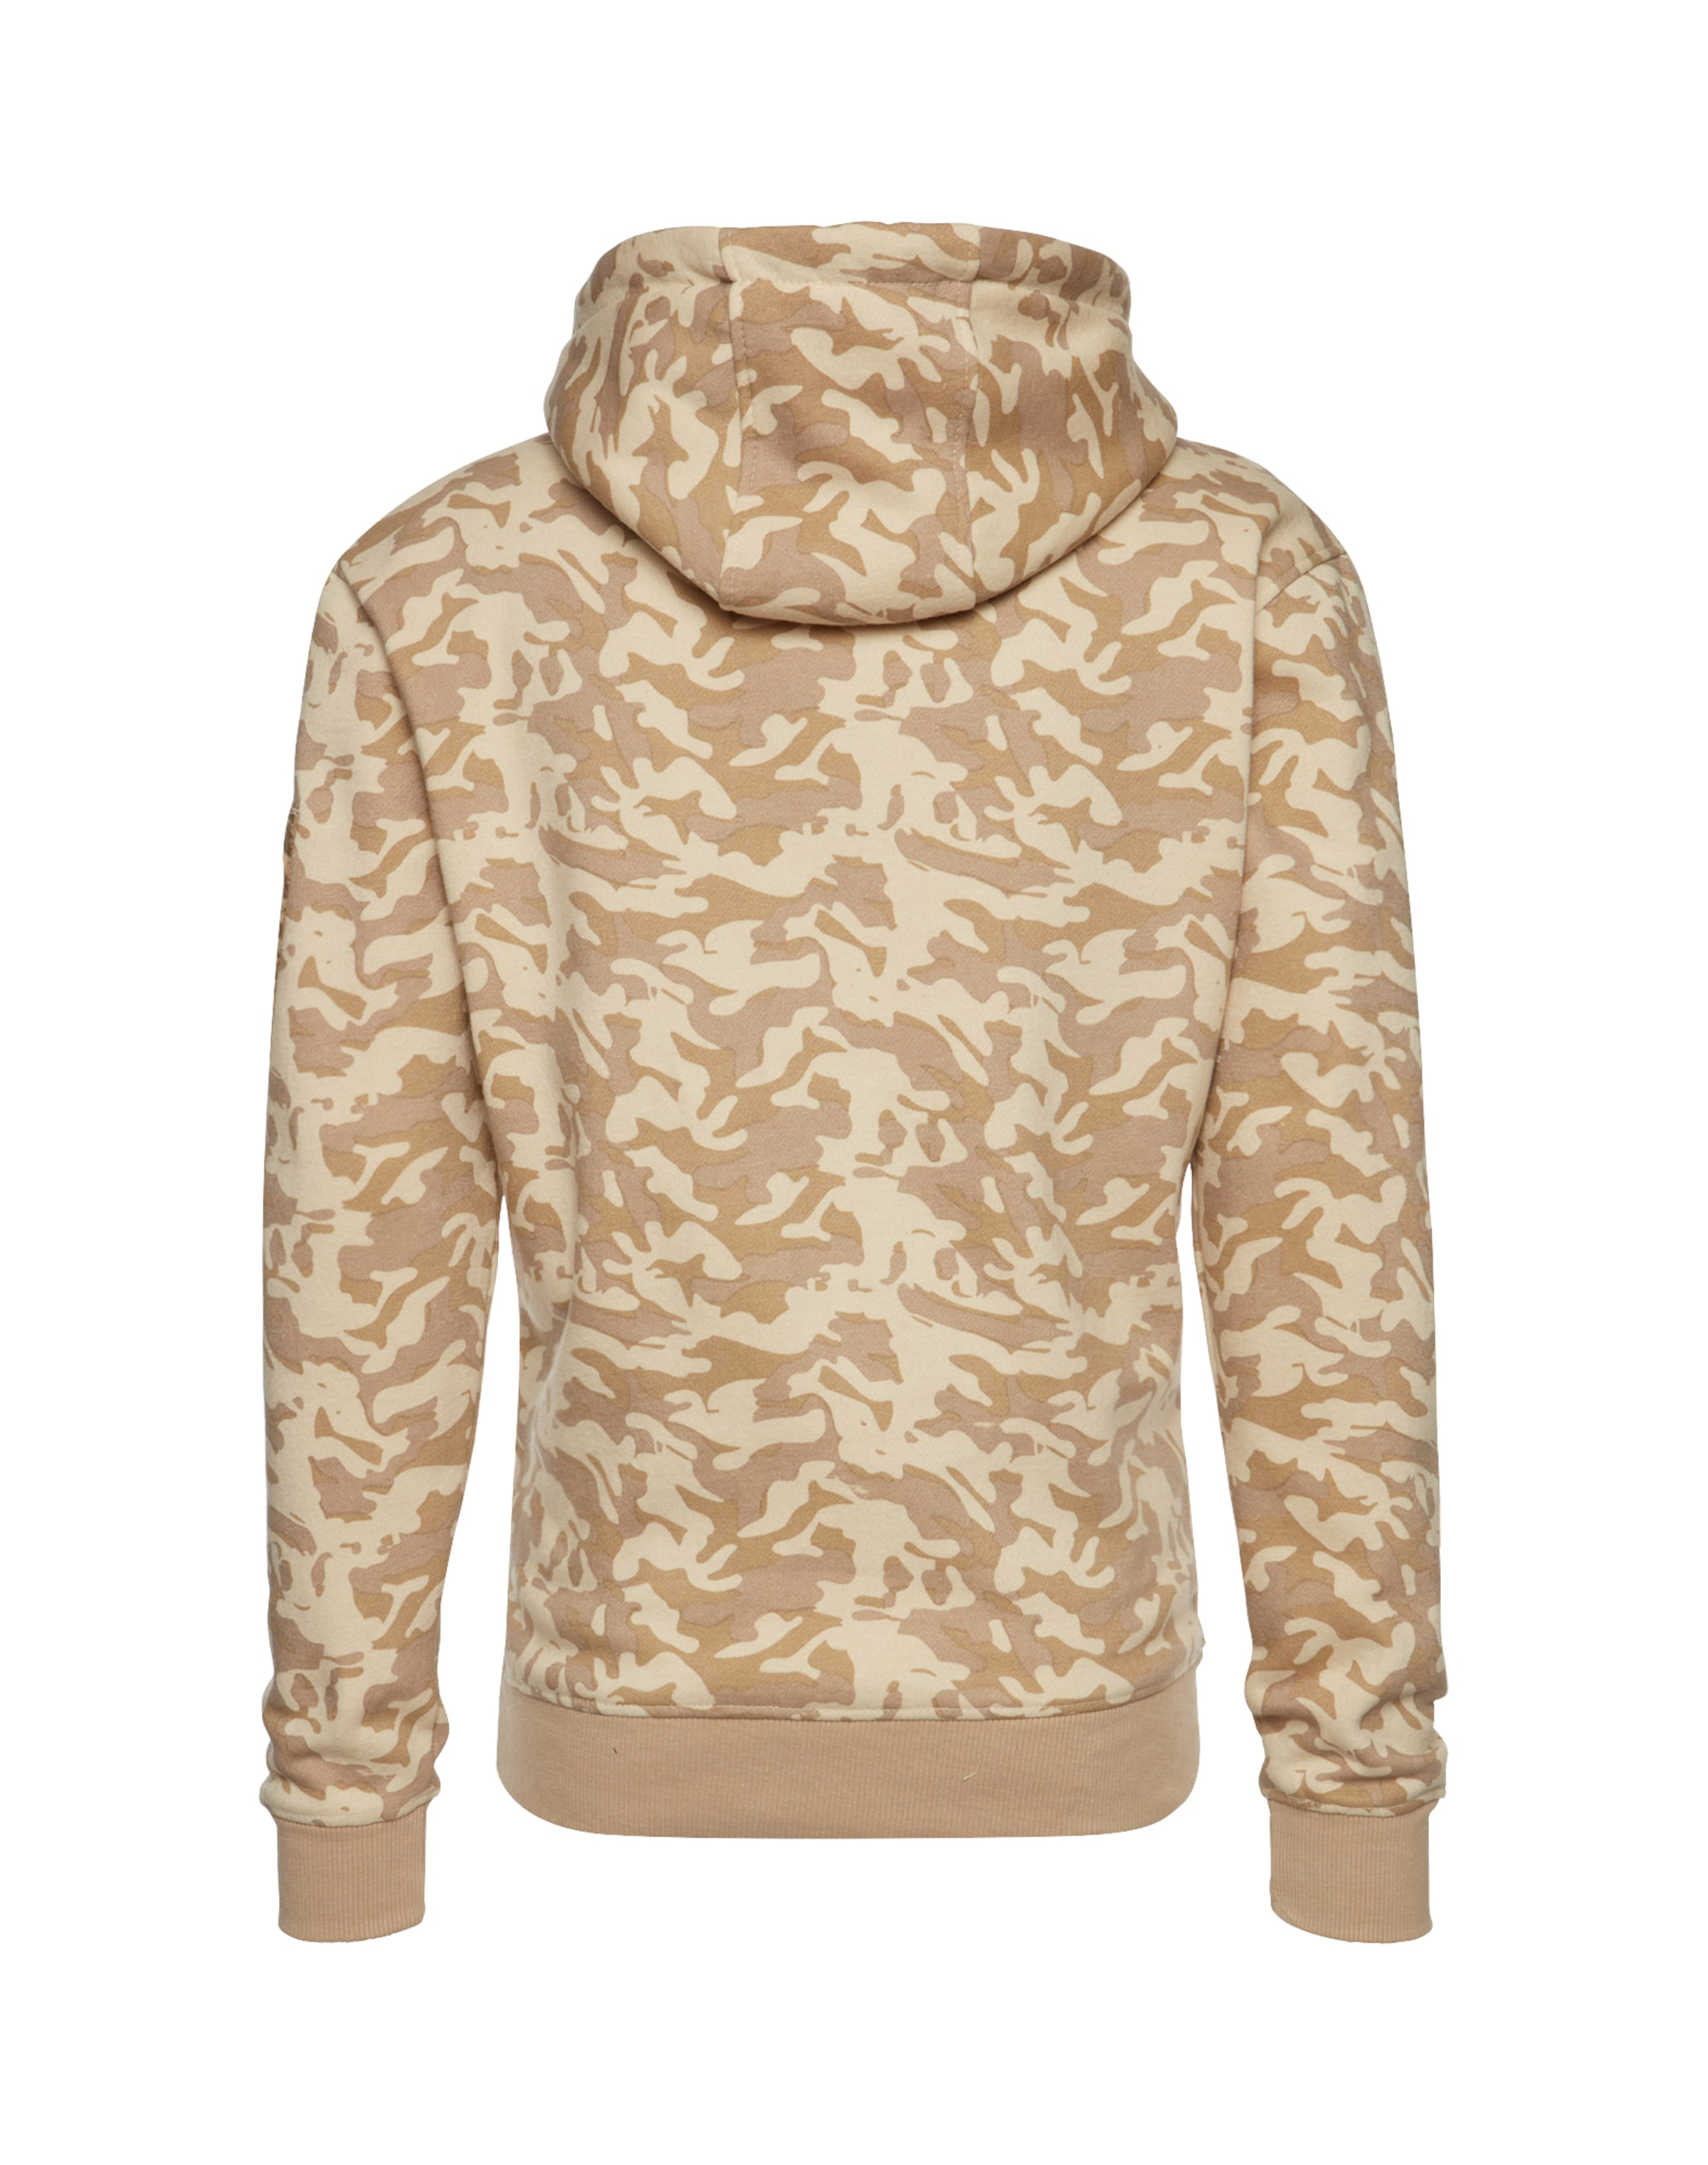 Classics Hoody' Sweatshirt Urban 'sweat Camo In Bomber SandMischfarben T1cKJ3lF